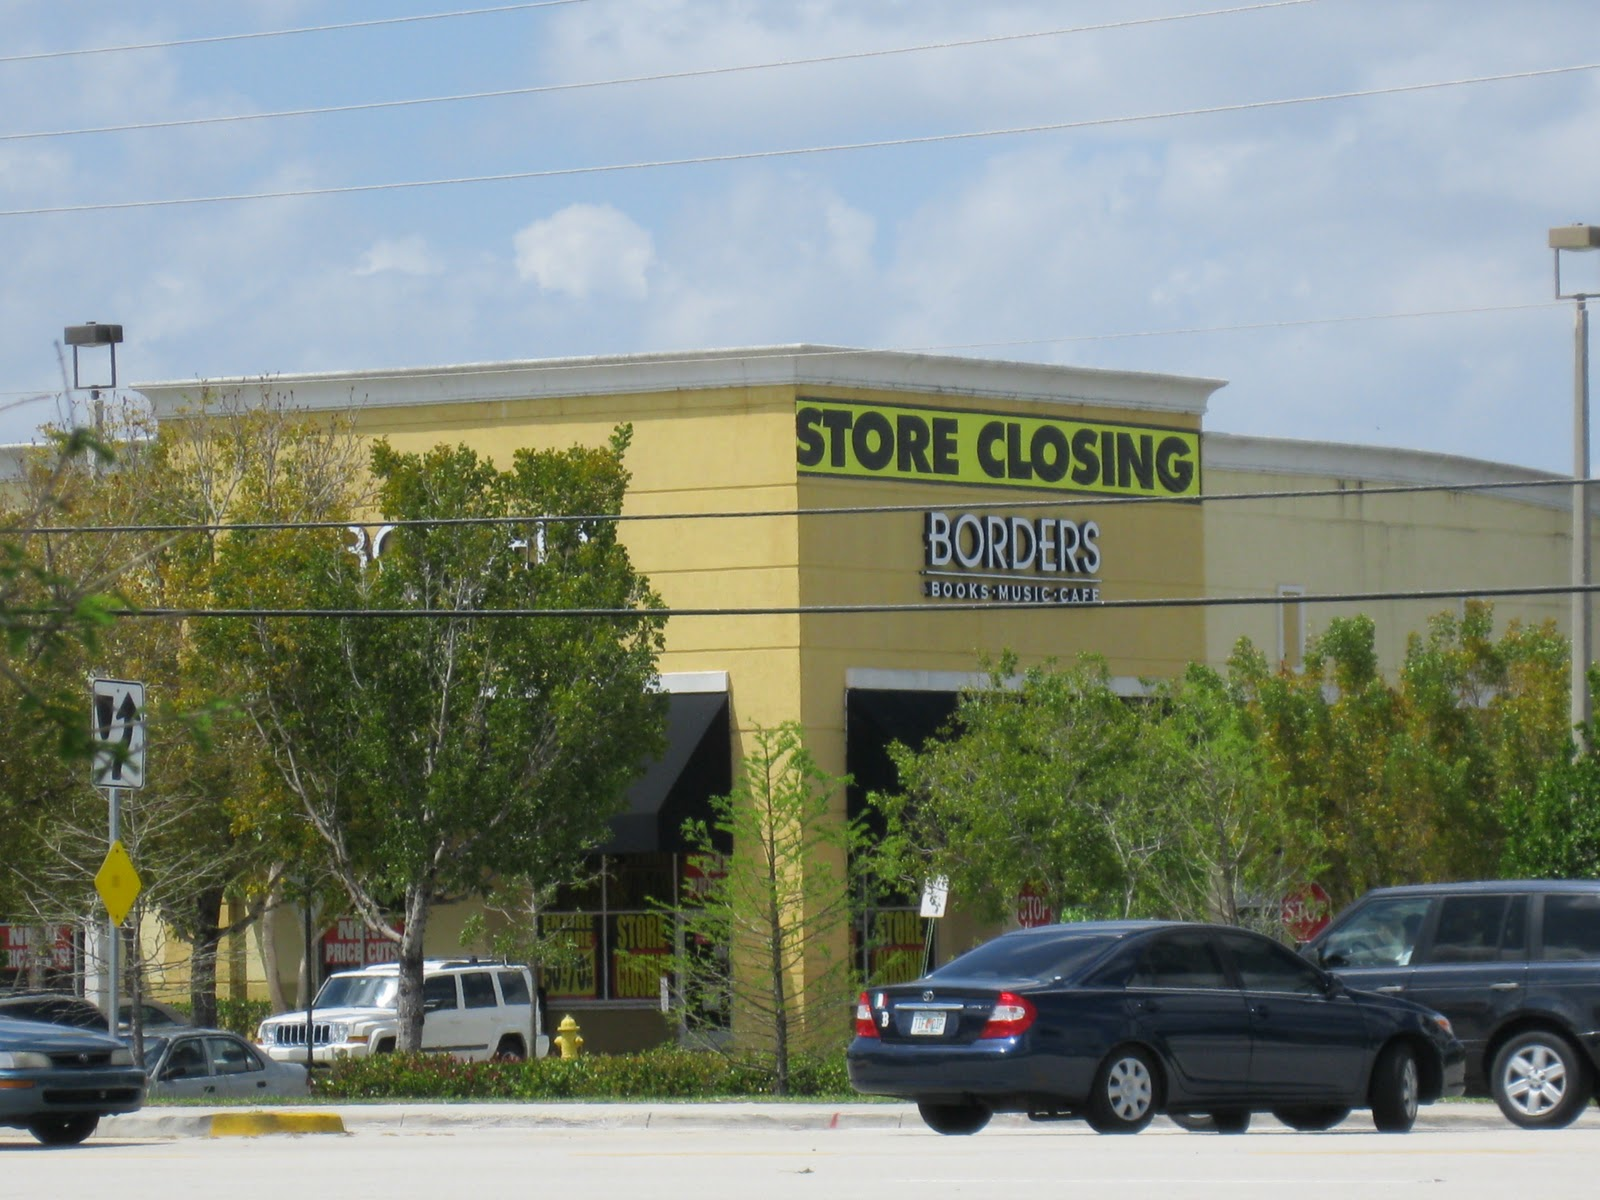 Borders Books Store Closing Sale Borders Store Closing Sunrise